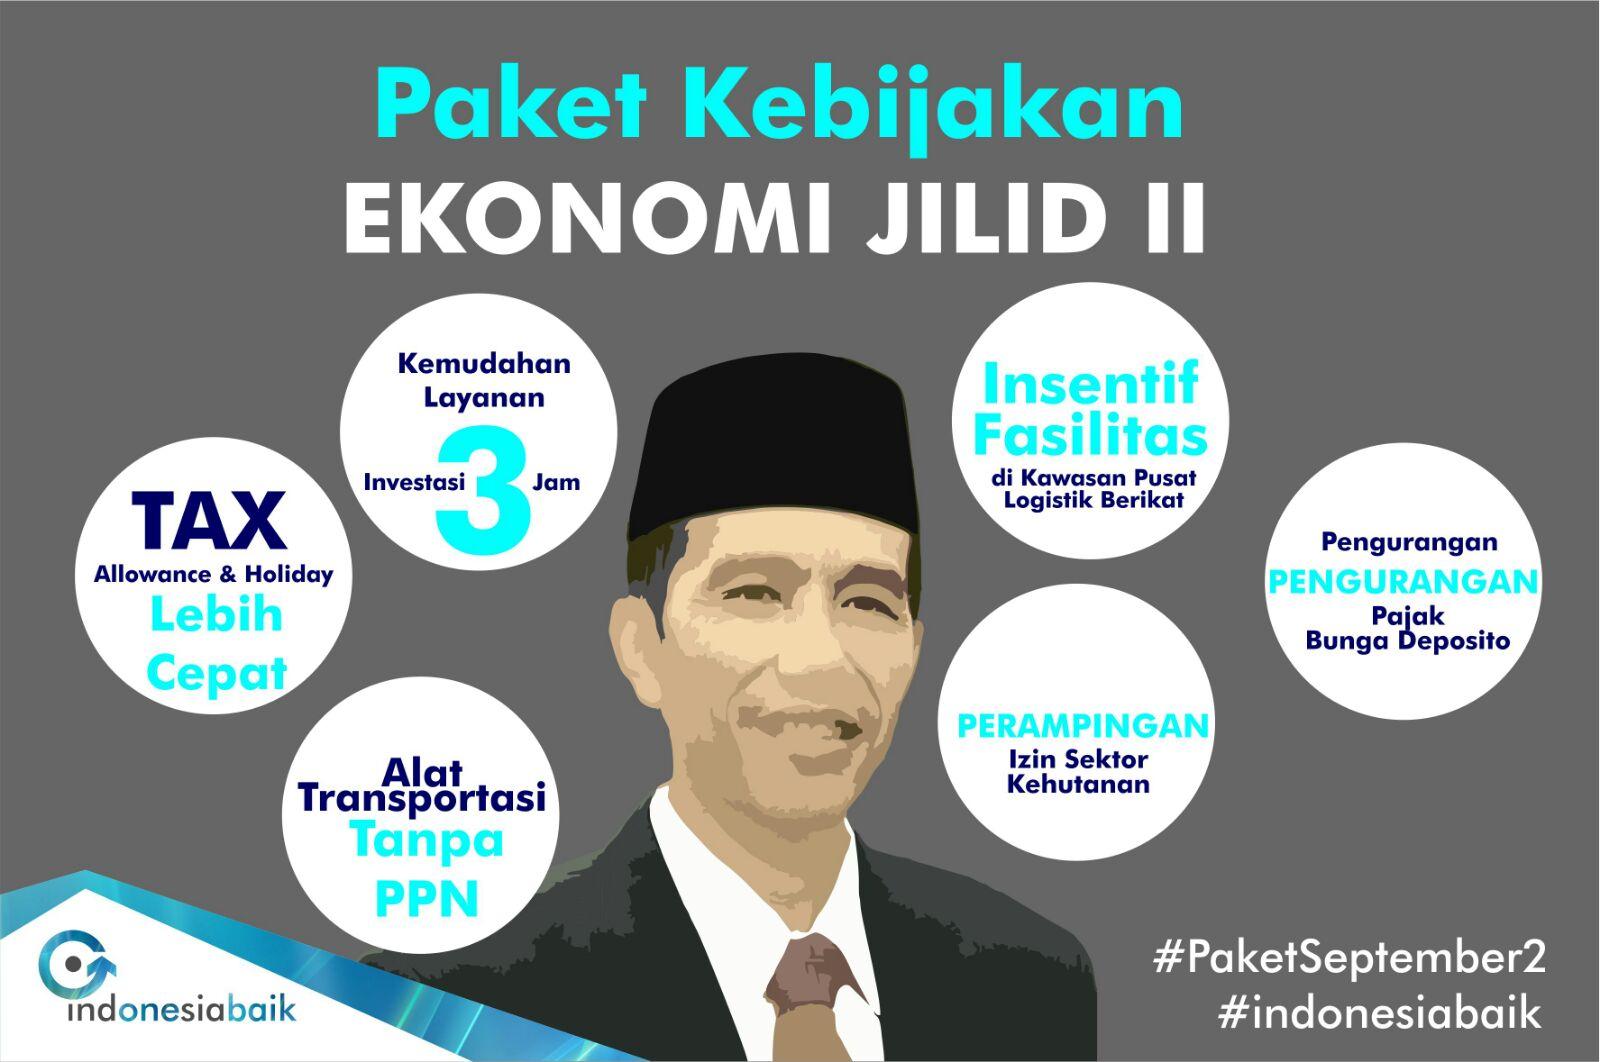 Paket Kebijakan Ekonomi Jilid II